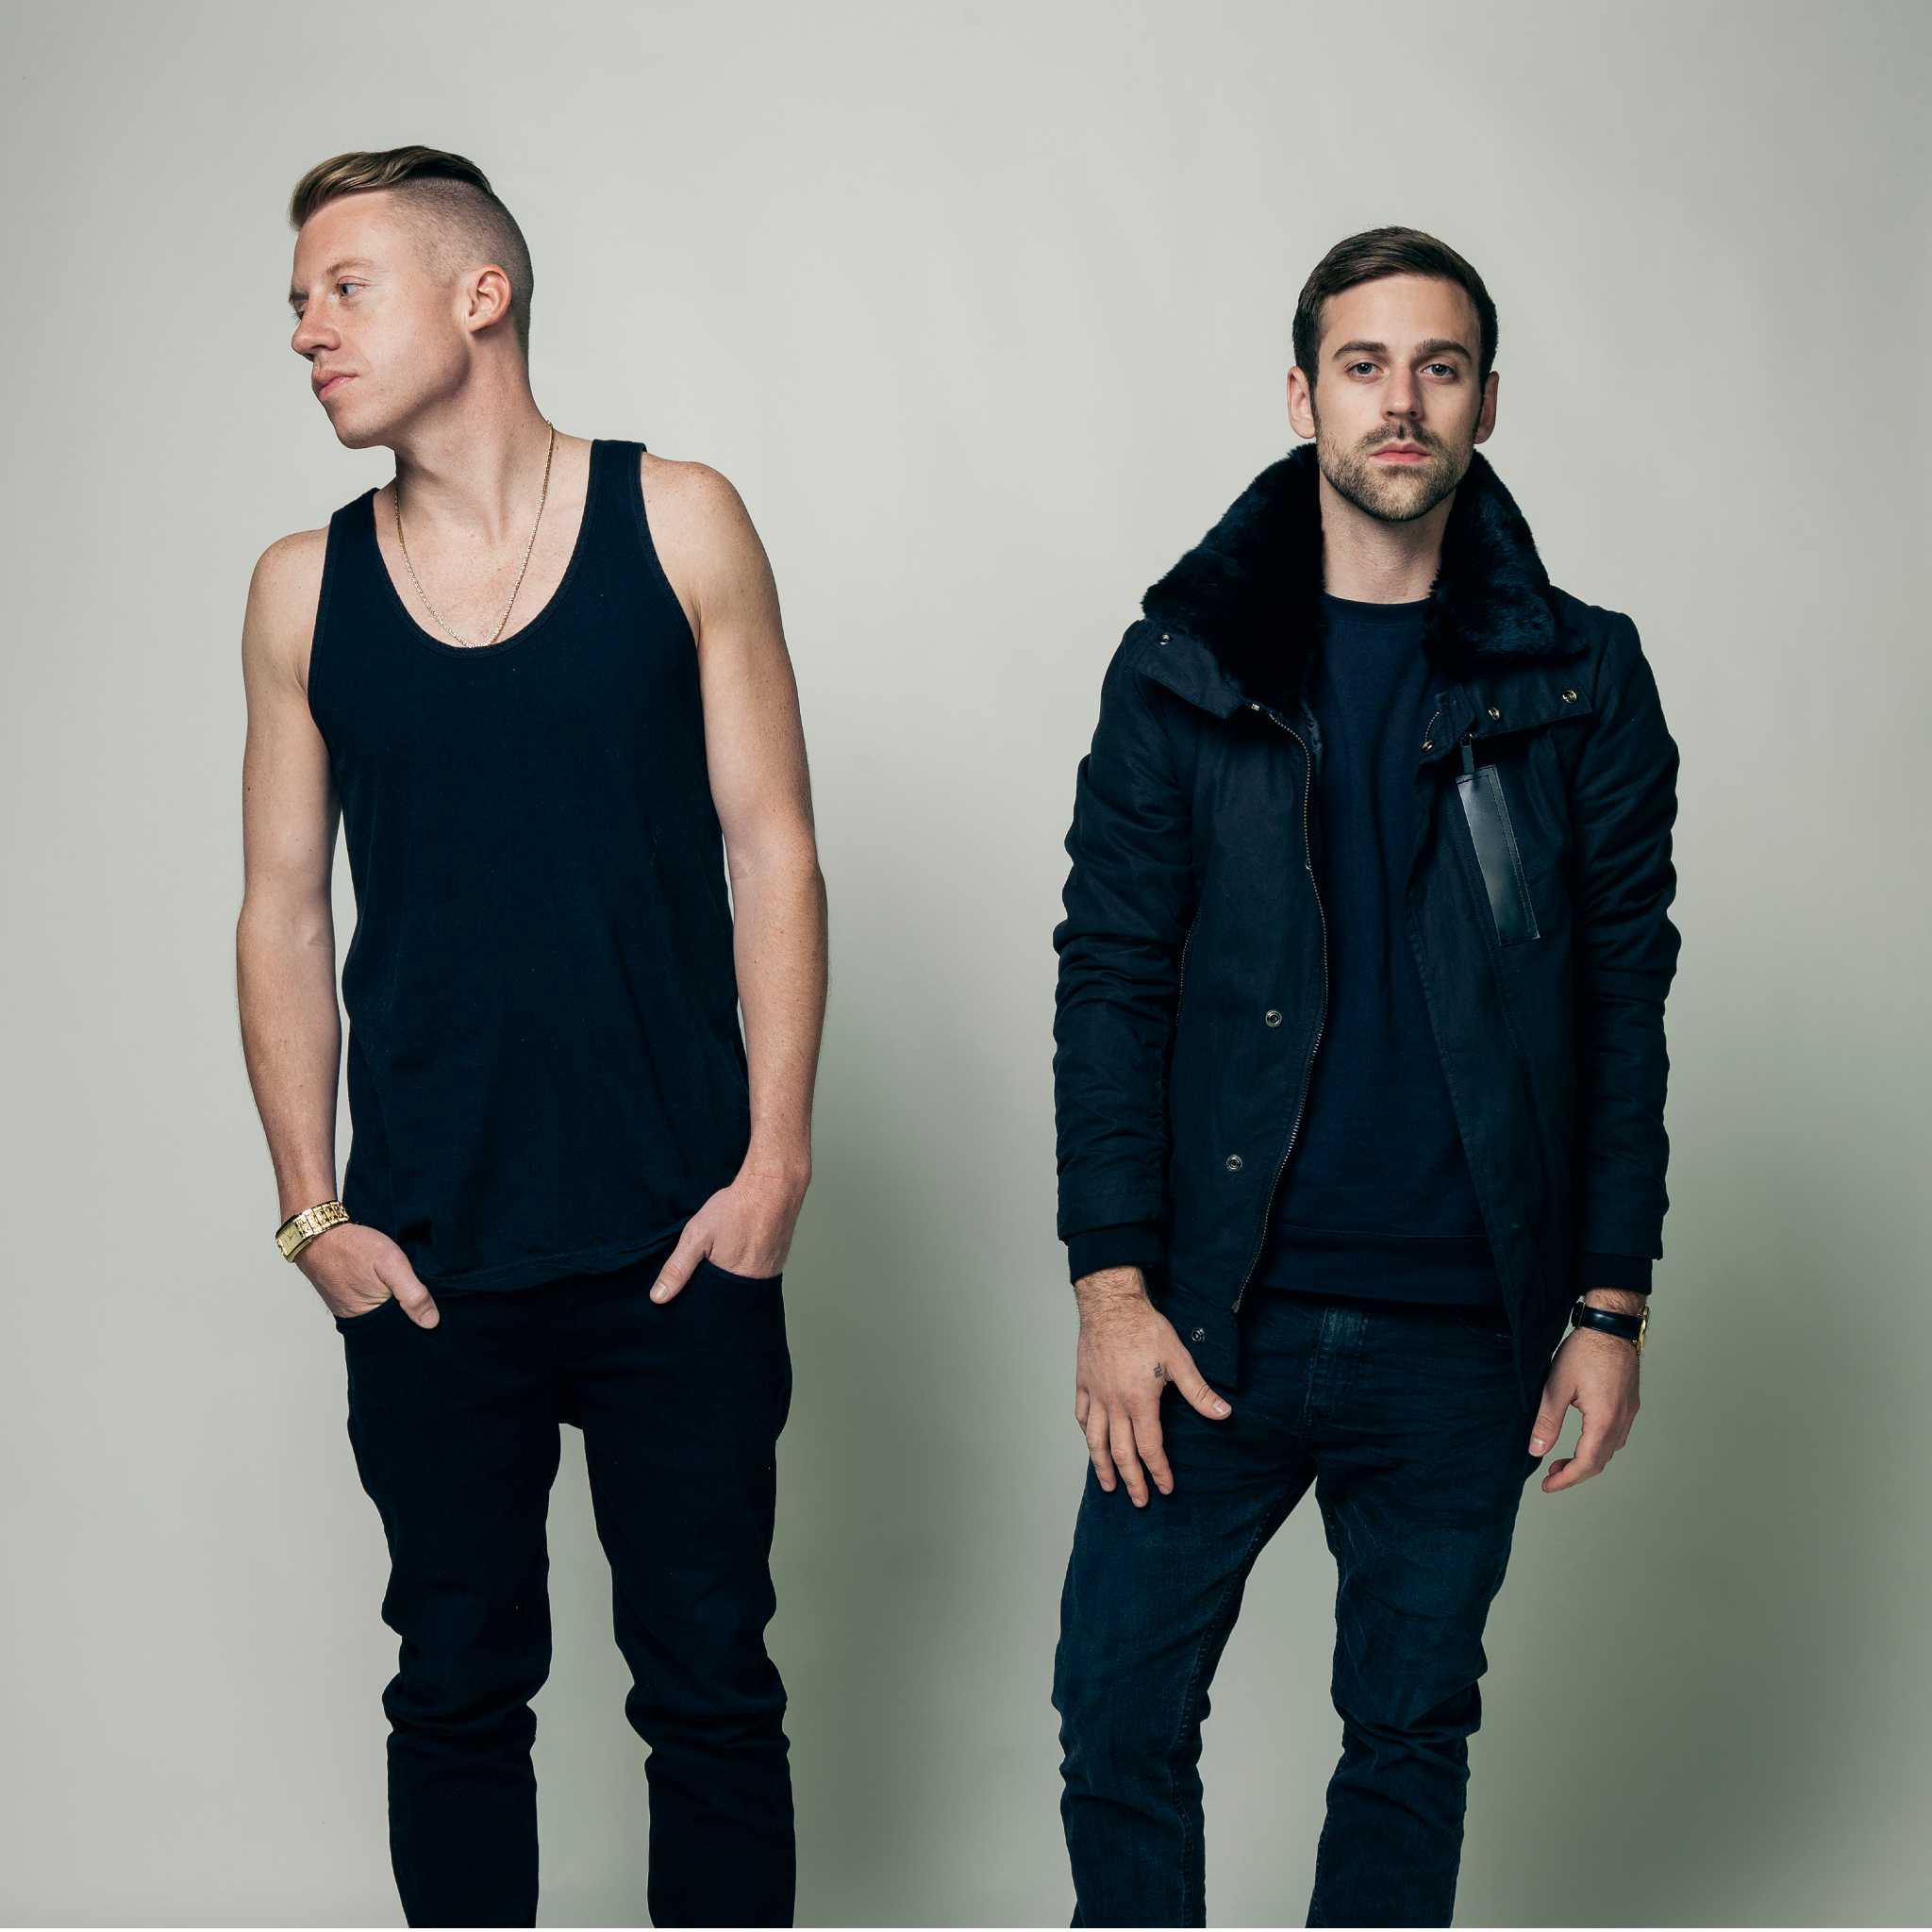 macklemore & ryan lewis don't follow the hip-hop pack